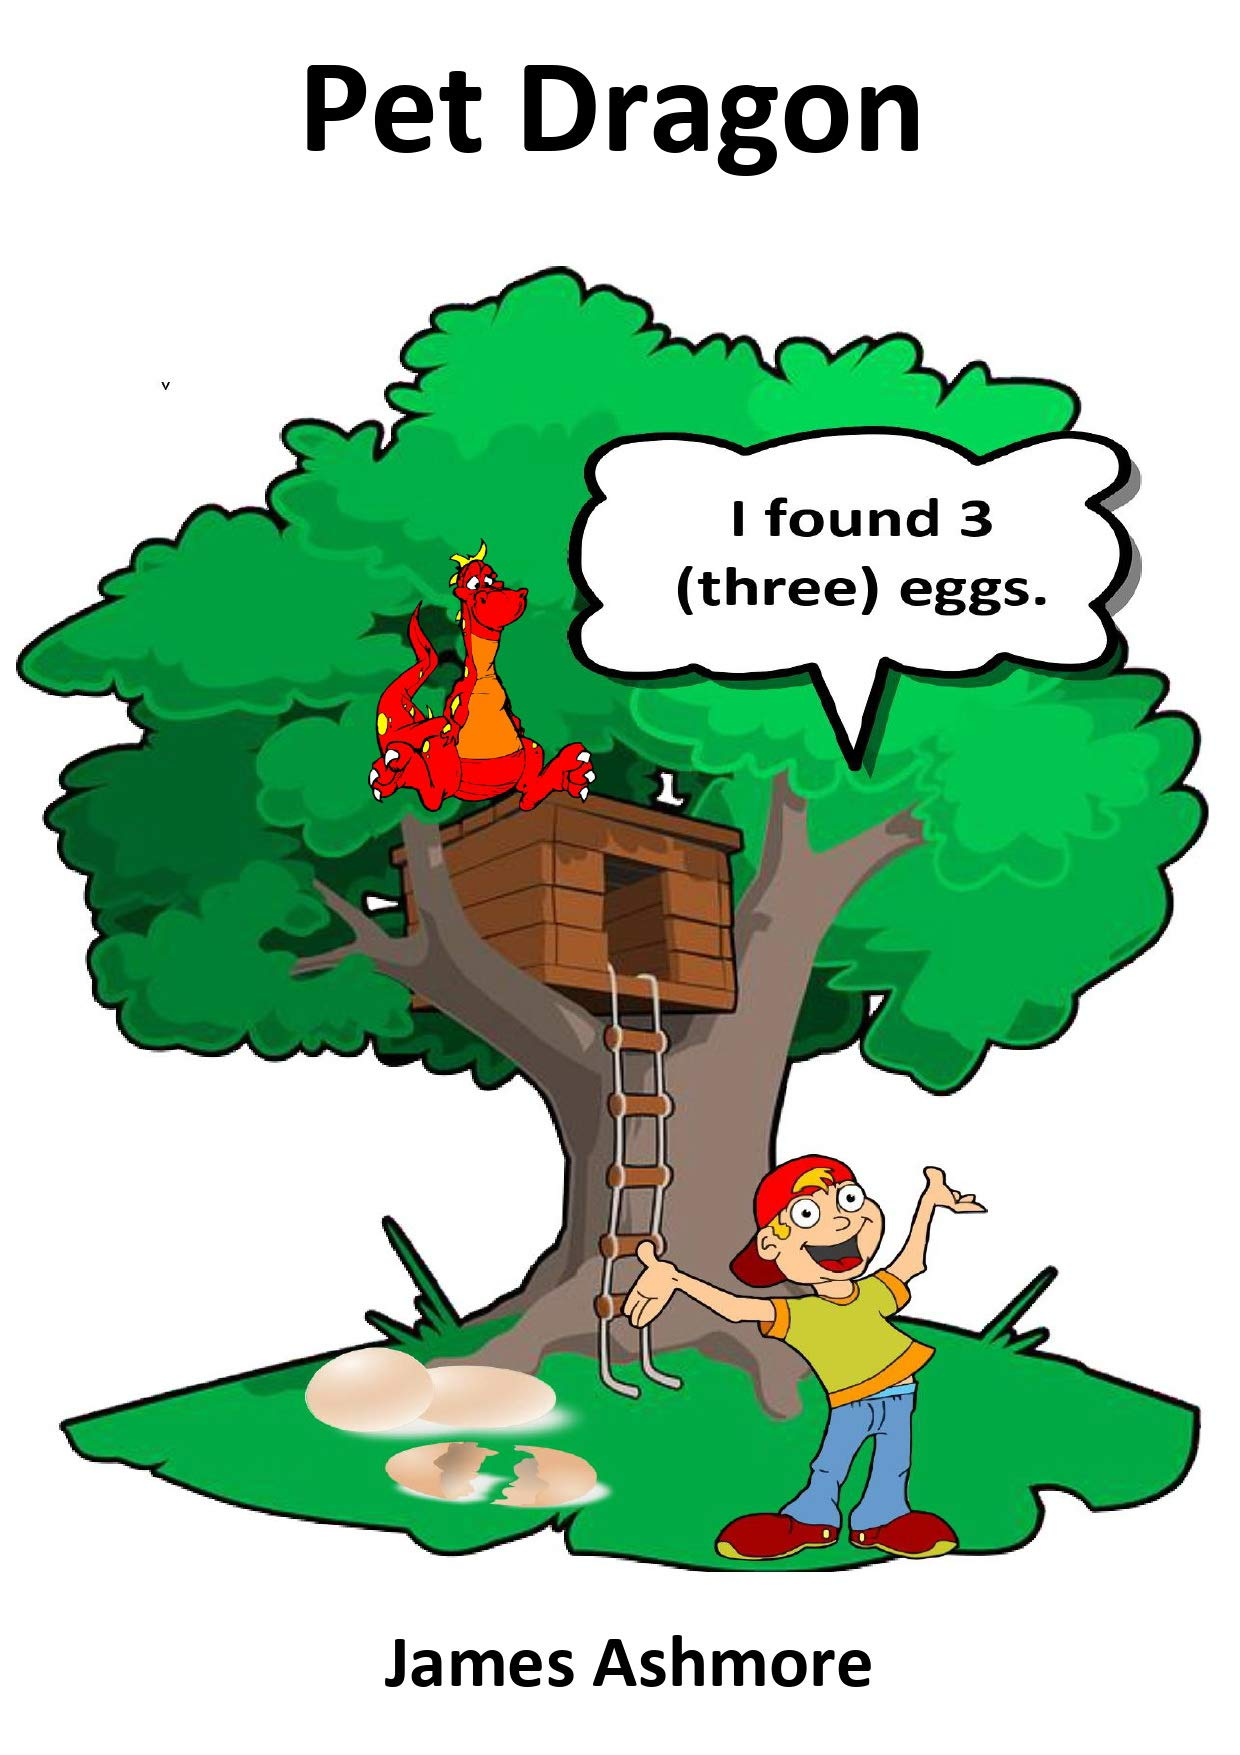 Pet Dragon: Grade 1 reading books, Kindergarten, Preschool, Nursery, year, Reading books, 1st graders, Childrens, Kids, grade, Ages, 3-5, 6-8, books, readers,1st,1